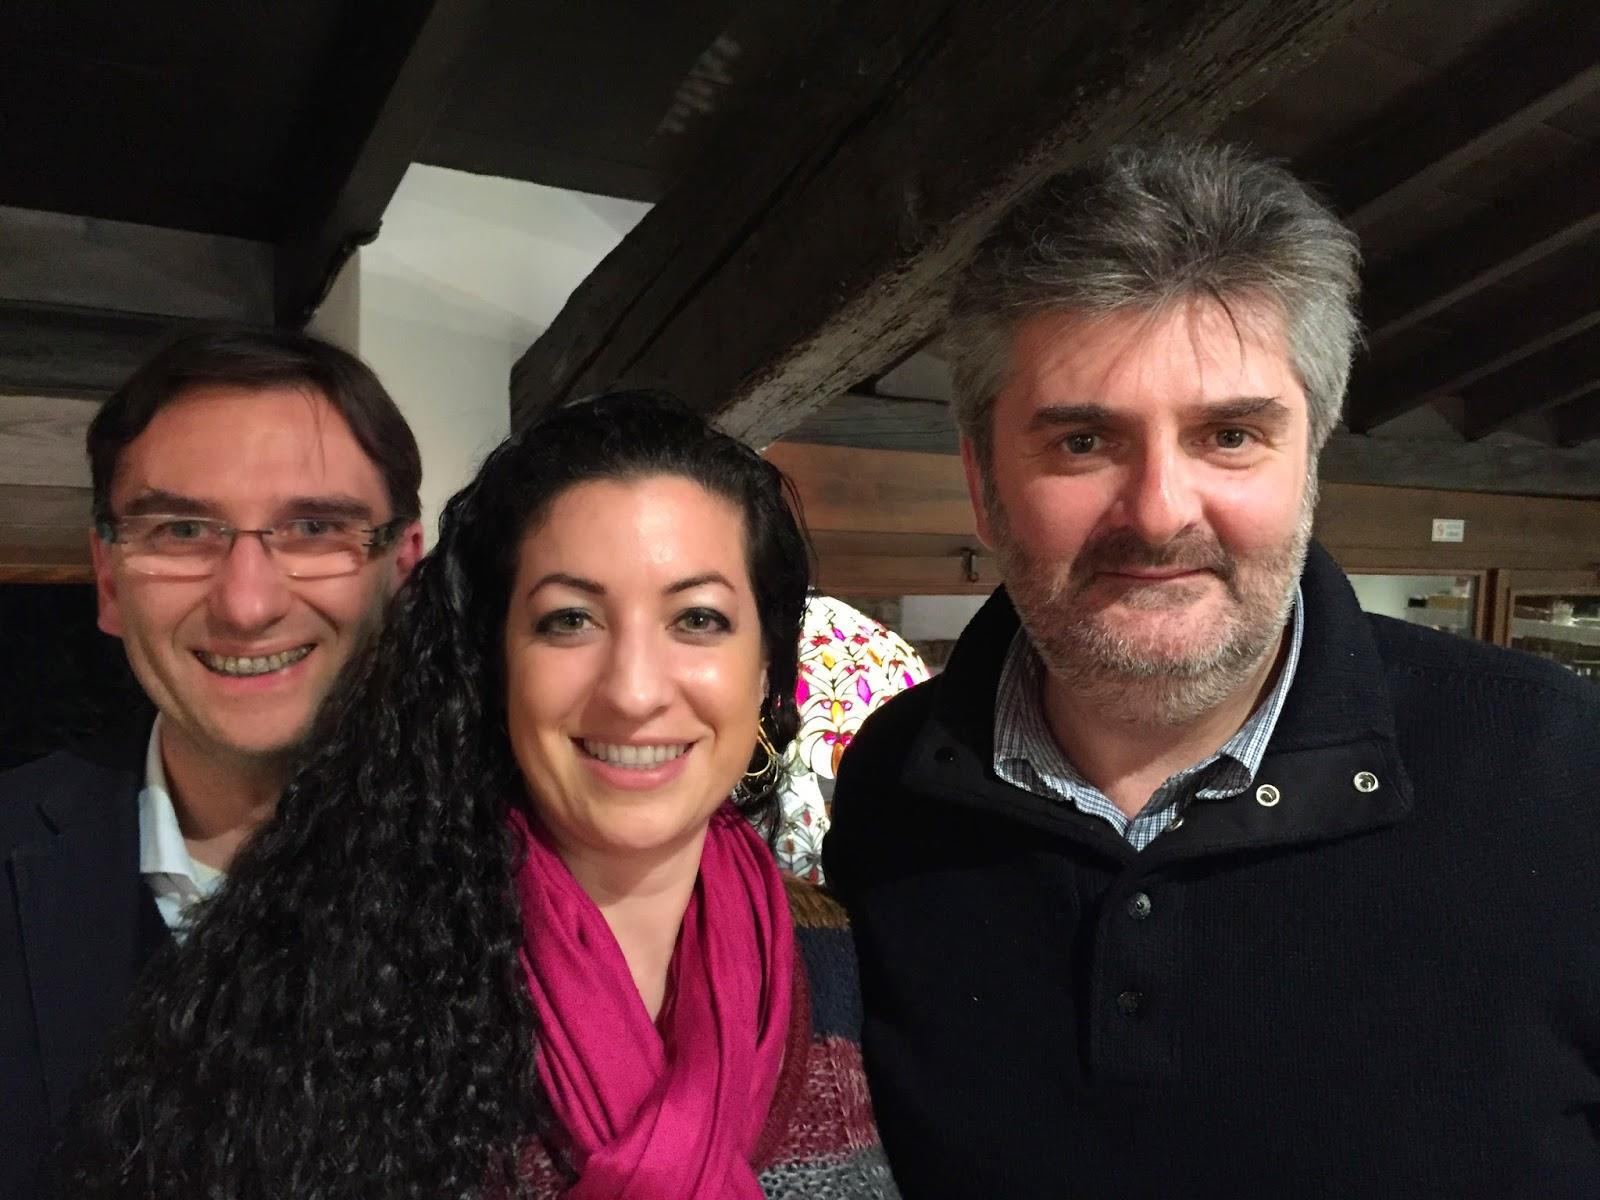 Christina Scrinzi & Giannantonio Marconi